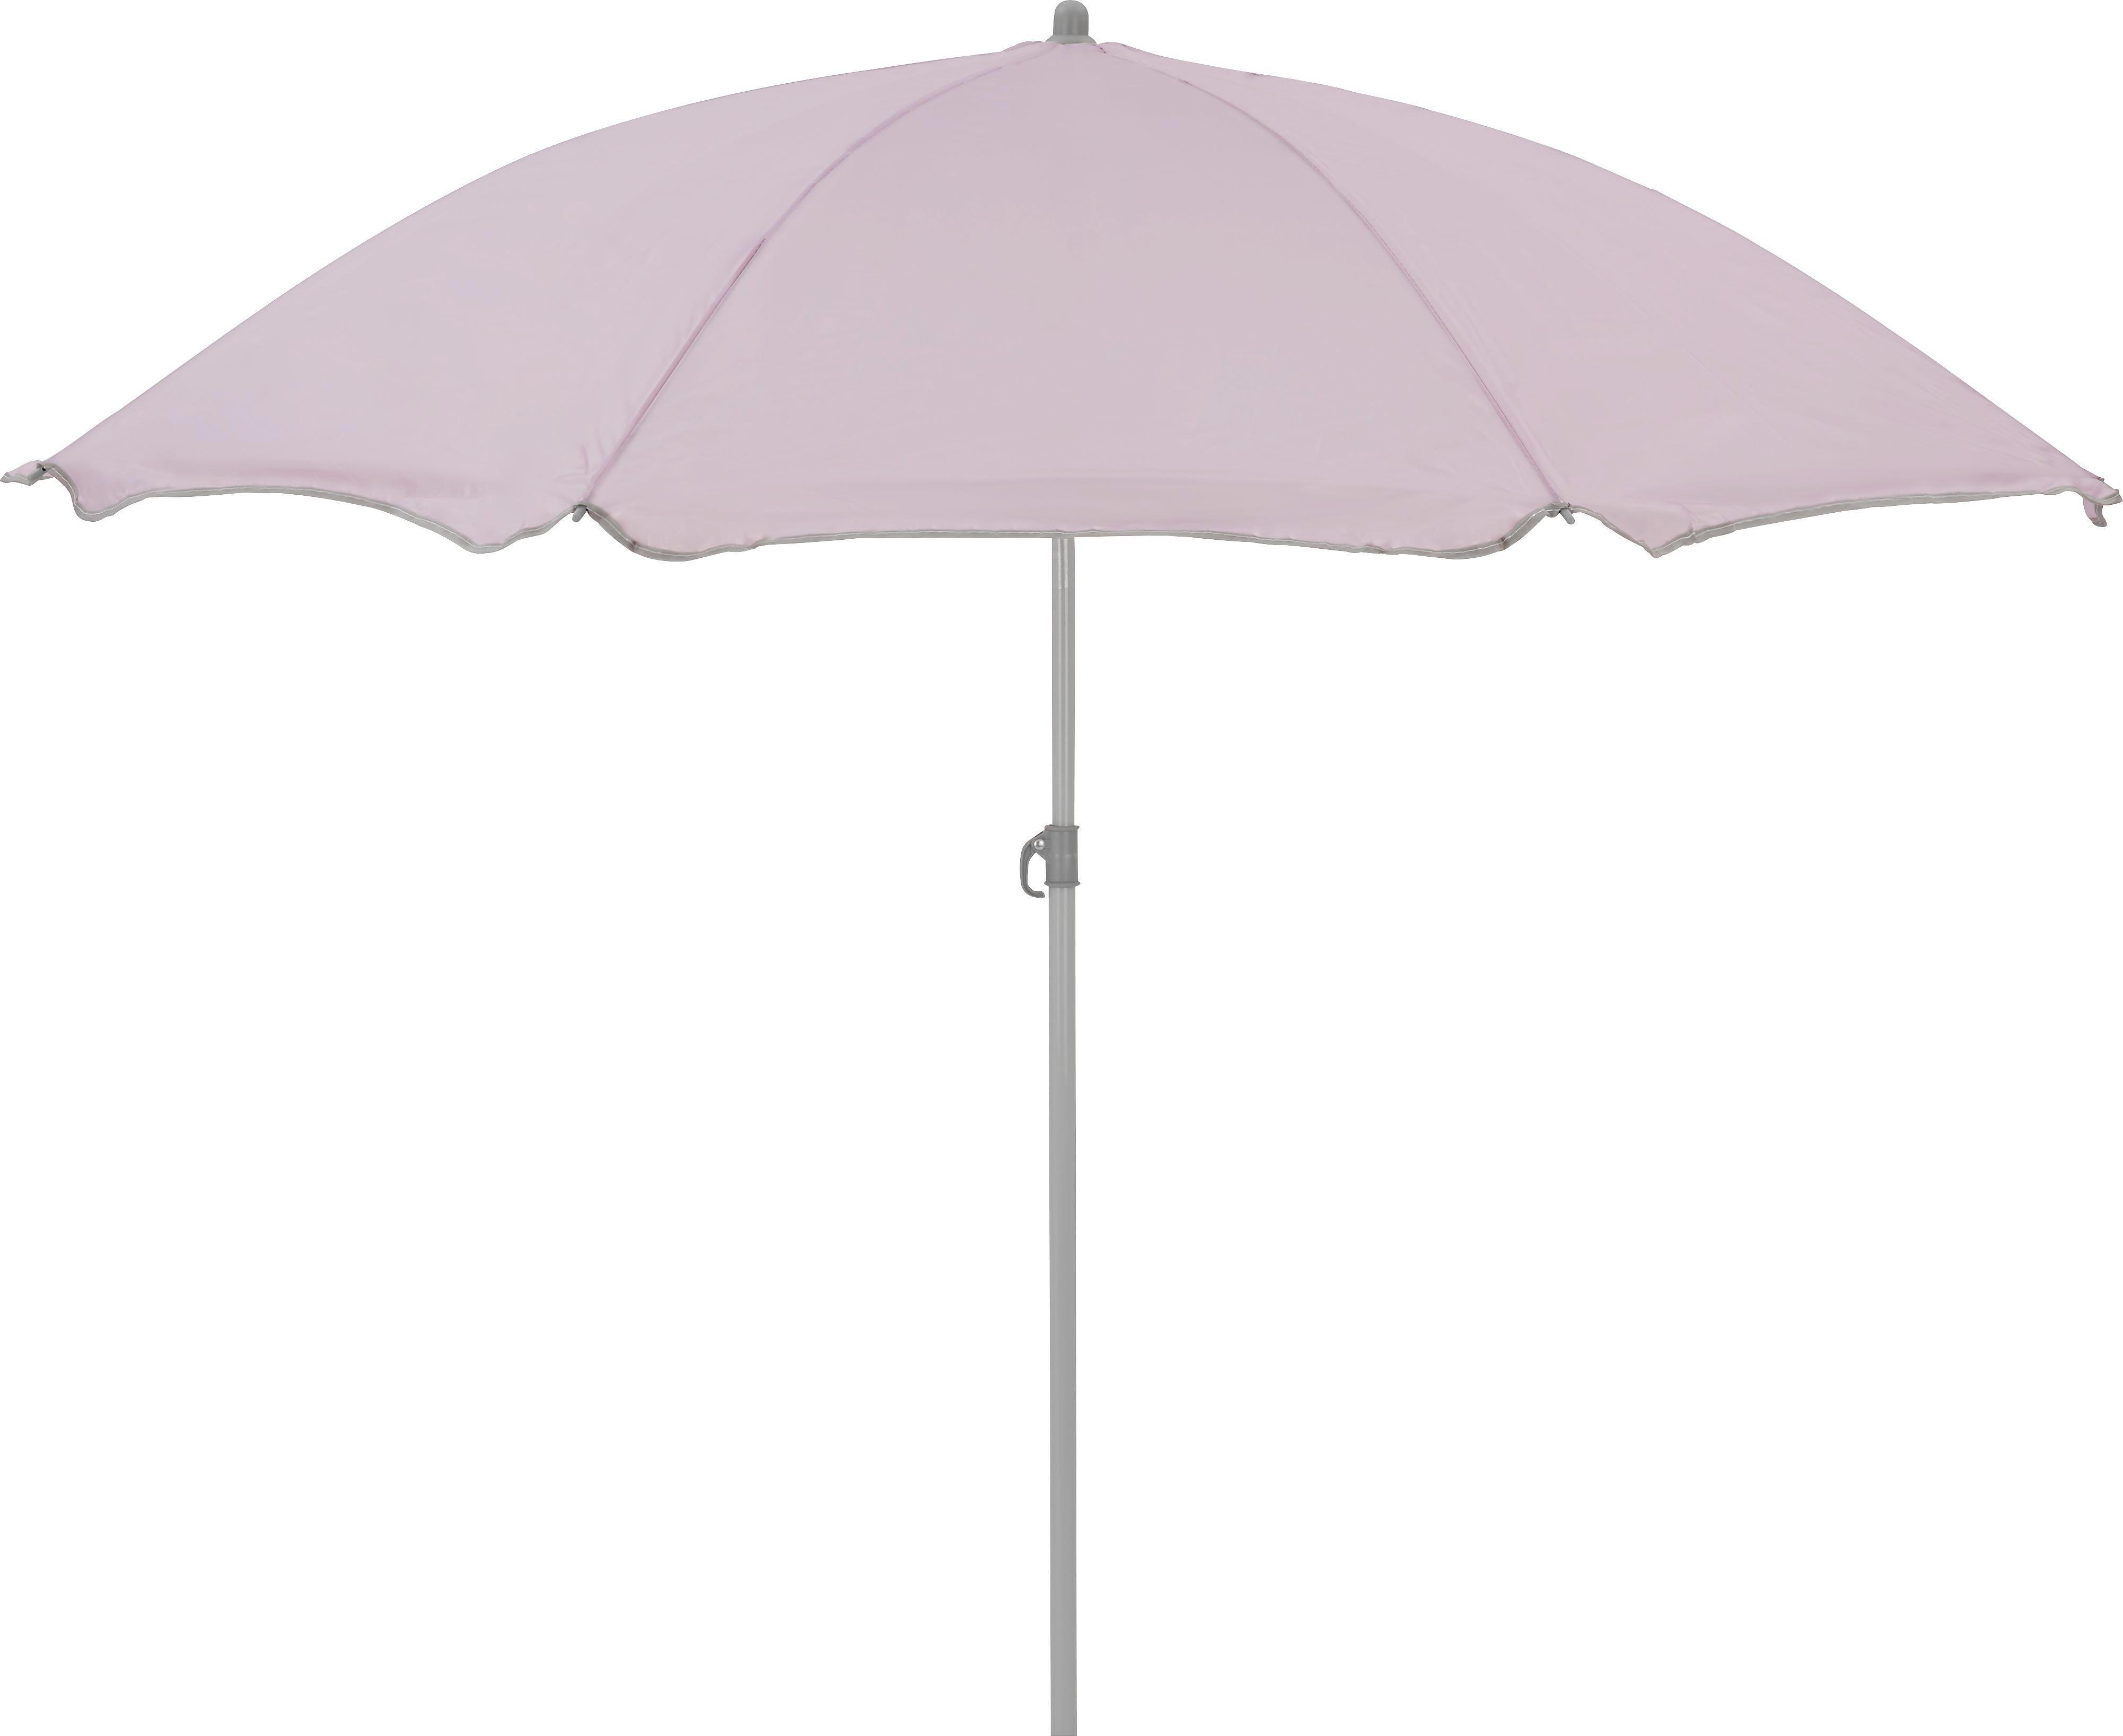 Sonnenschirm Lecci in Altrosa - Altrosa/Grau, Kunststoff/Metall (180/190cm) - MÖMAX modern living